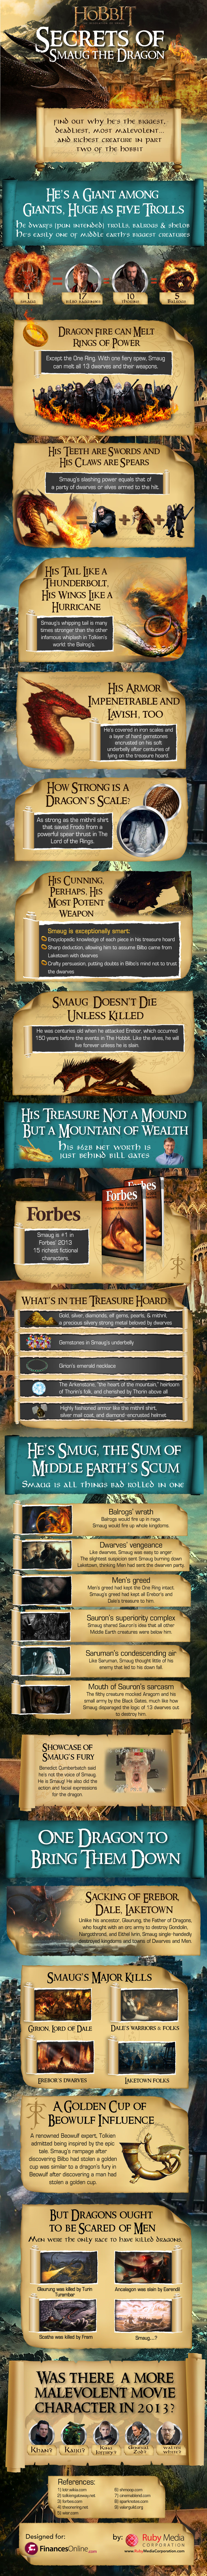 hobbit-infographic